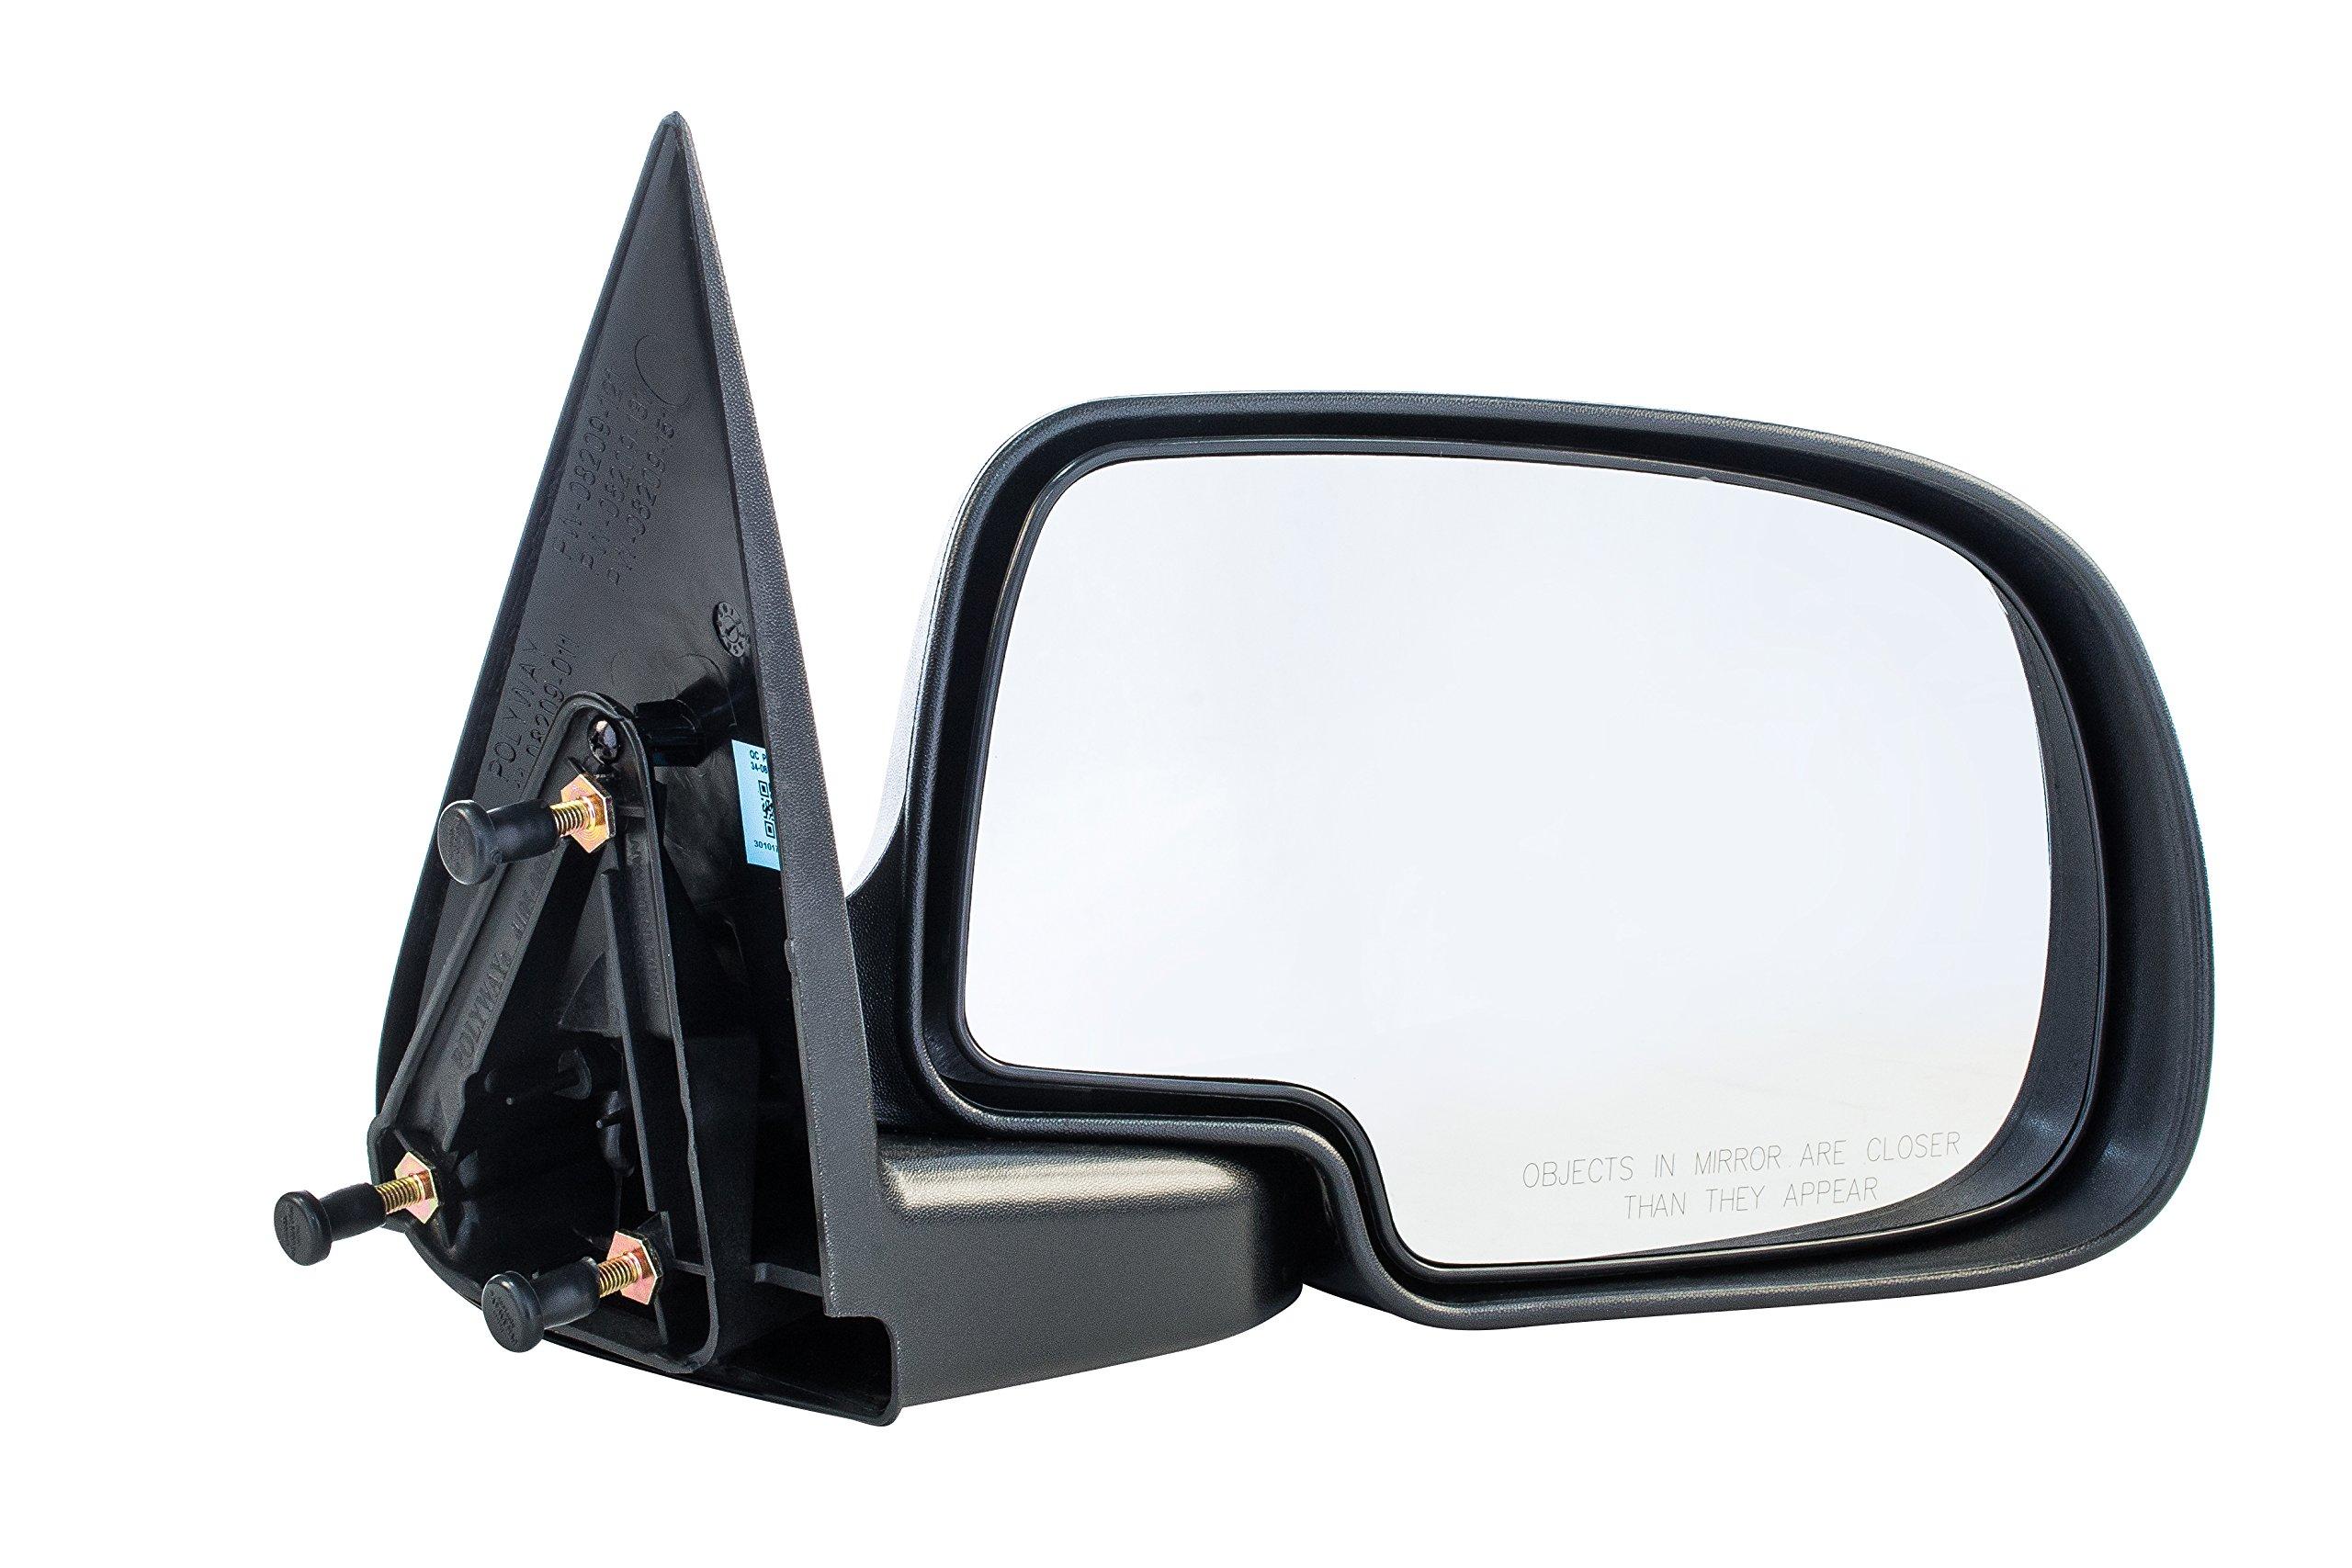 Passenger Side Mirror Cadillac Escalade Chevy Silverado GMC Sierra Yukon Textured Non-Heated Folding Right Outside Rear View Replacement Door Mirror (1999 2000 2001 2002 2003 2004 2005 2006 2007)